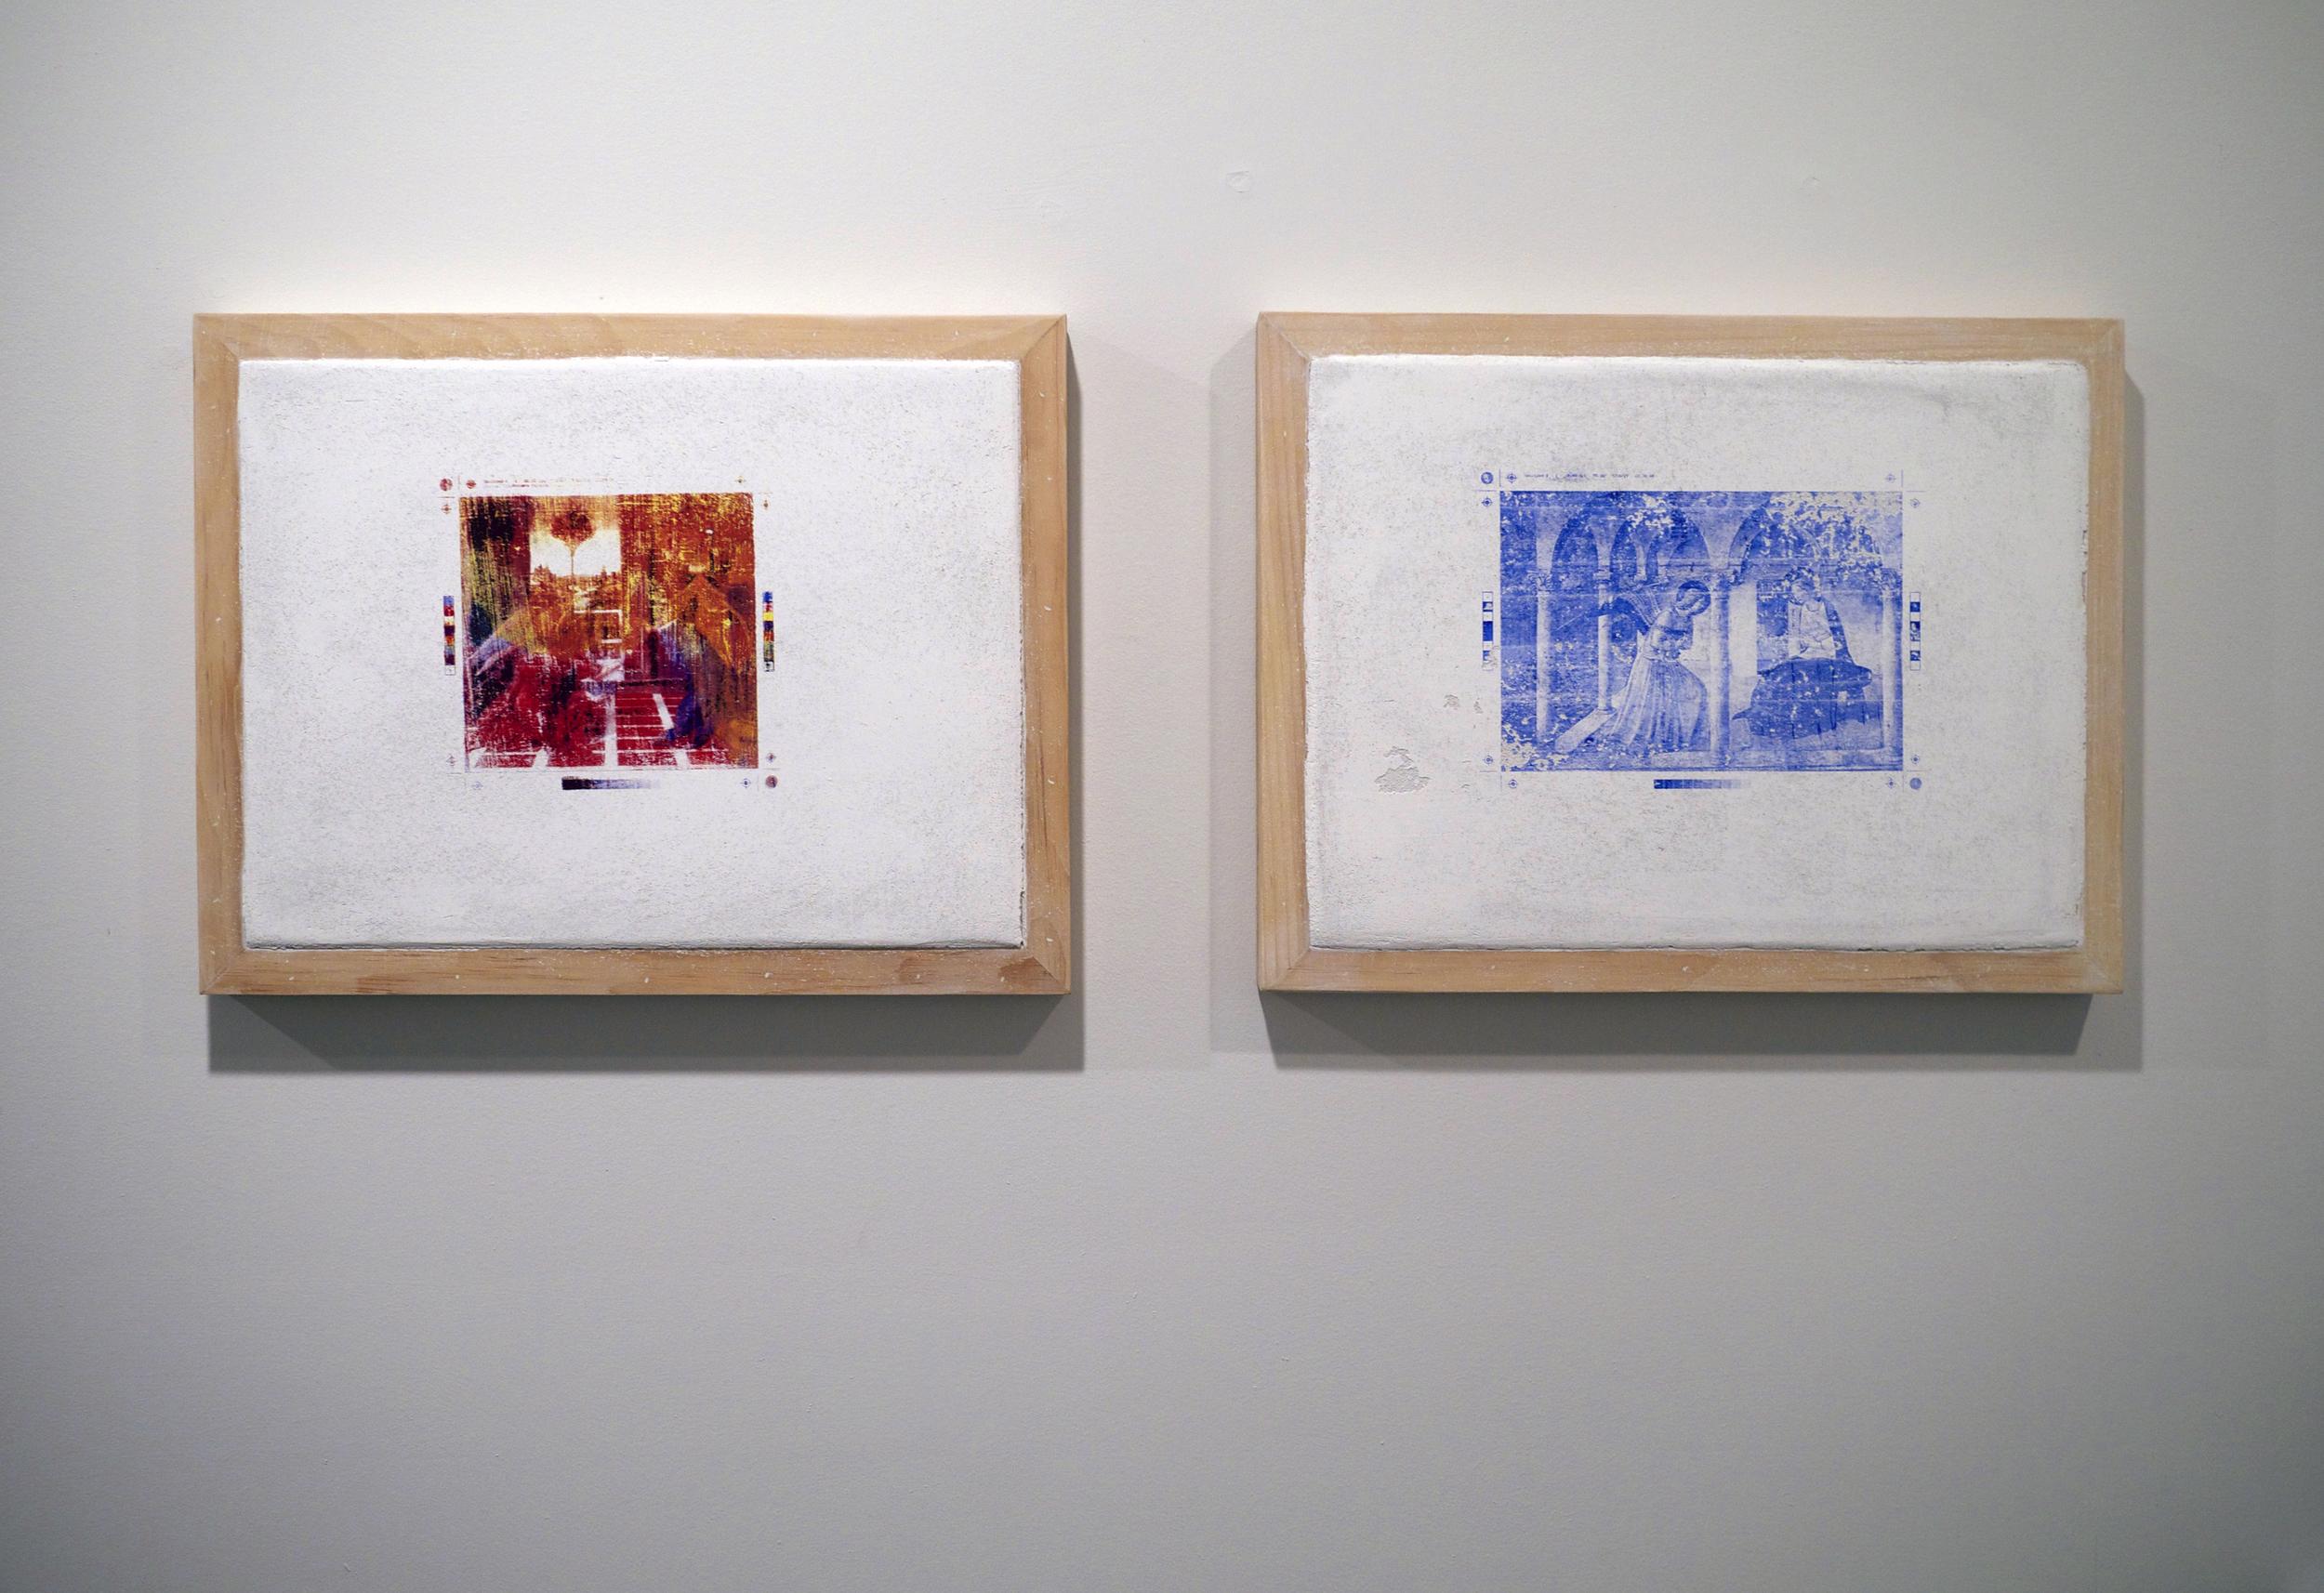 "Christopher Carroll. Left:  Untitled Fresco Panel 1 . Right:  Untitled Fresco Panel 2 . Fresco, raw pigment. 14.5"" x 18.5"". 2013."